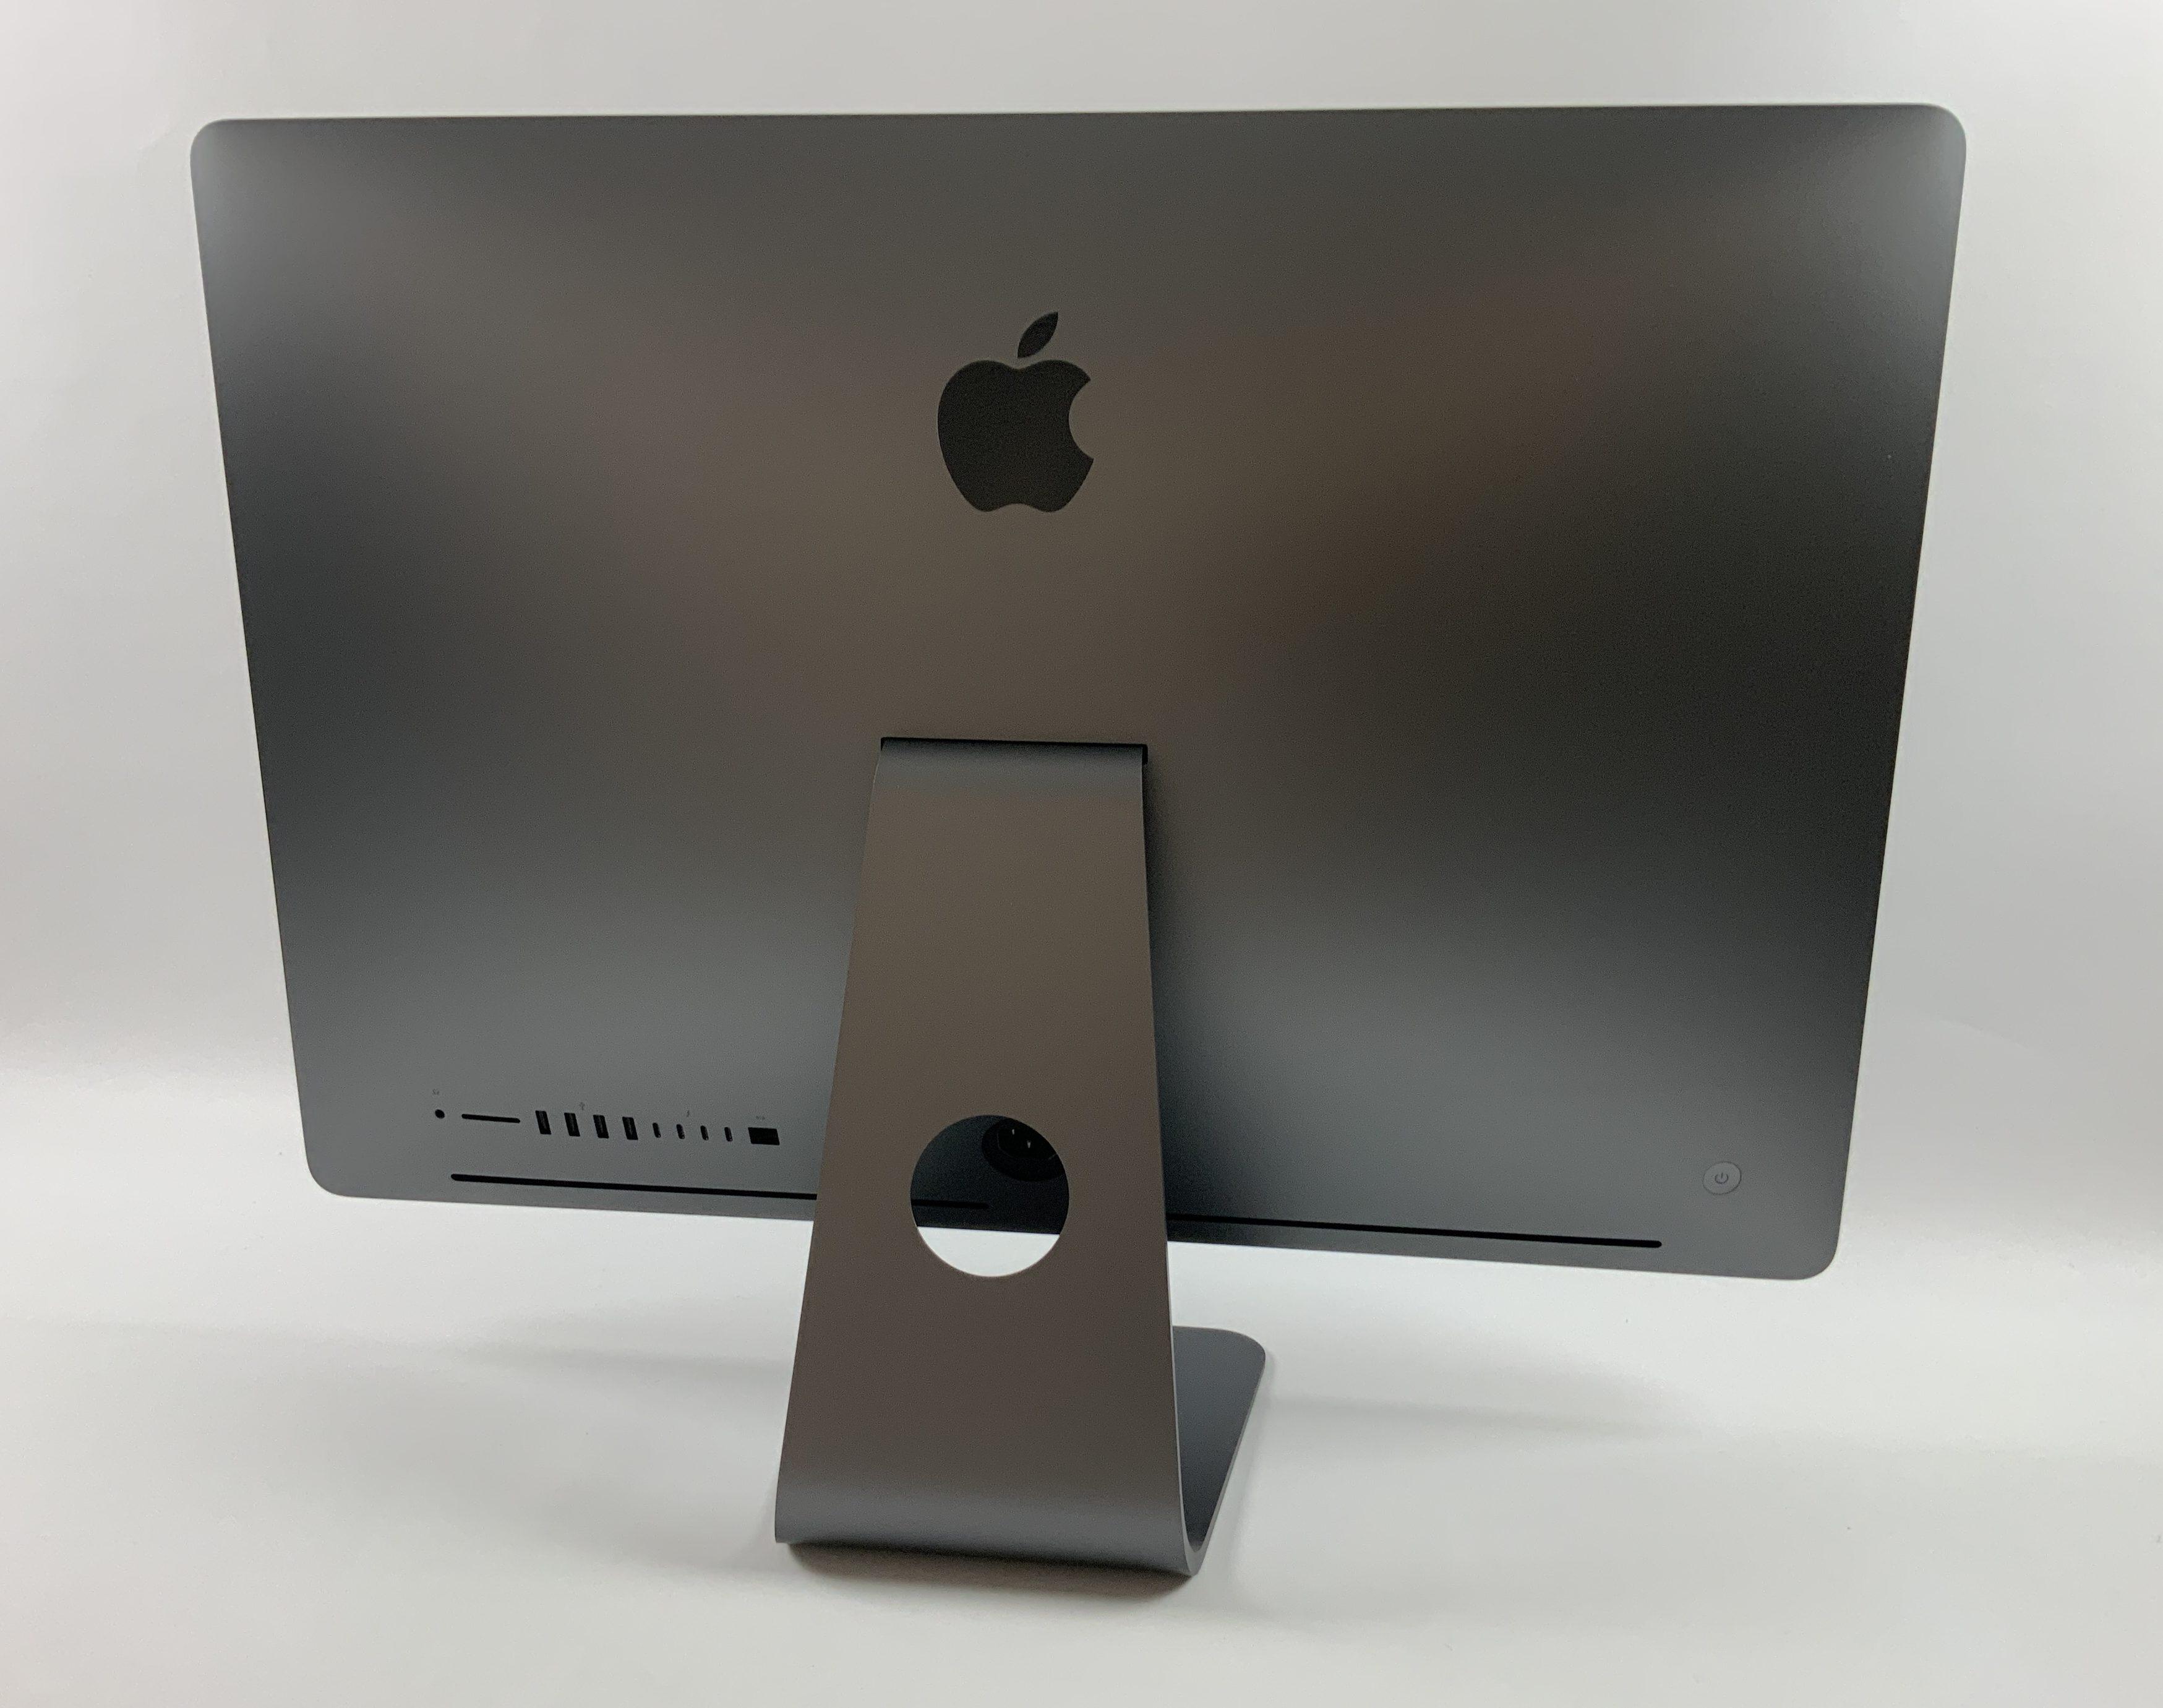 iMac Pro 2017 (Intel 10-Core Xeon W 3.0 GHz 32 GB RAM 1 TB SSD), Intel 10-Core Xeon W 3.0 GHz, 32 GB RAM, 1 TB SSD, obraz 2